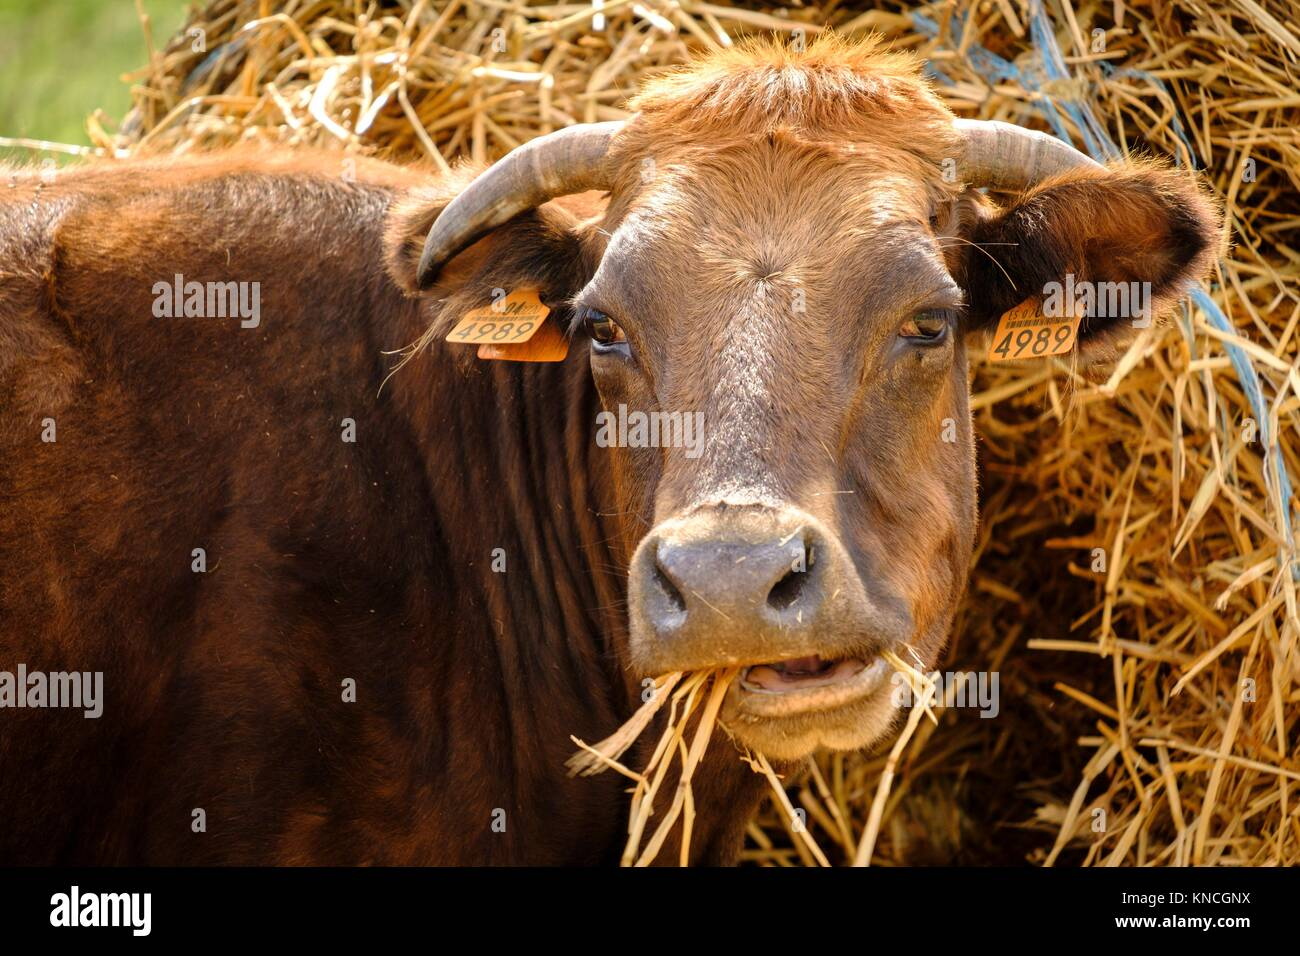 vaca autoctona mallorquina, finca Es Bosch Vell, Santa Margalida, Mallorca, balearic islands, spain, europe. - Stock Image